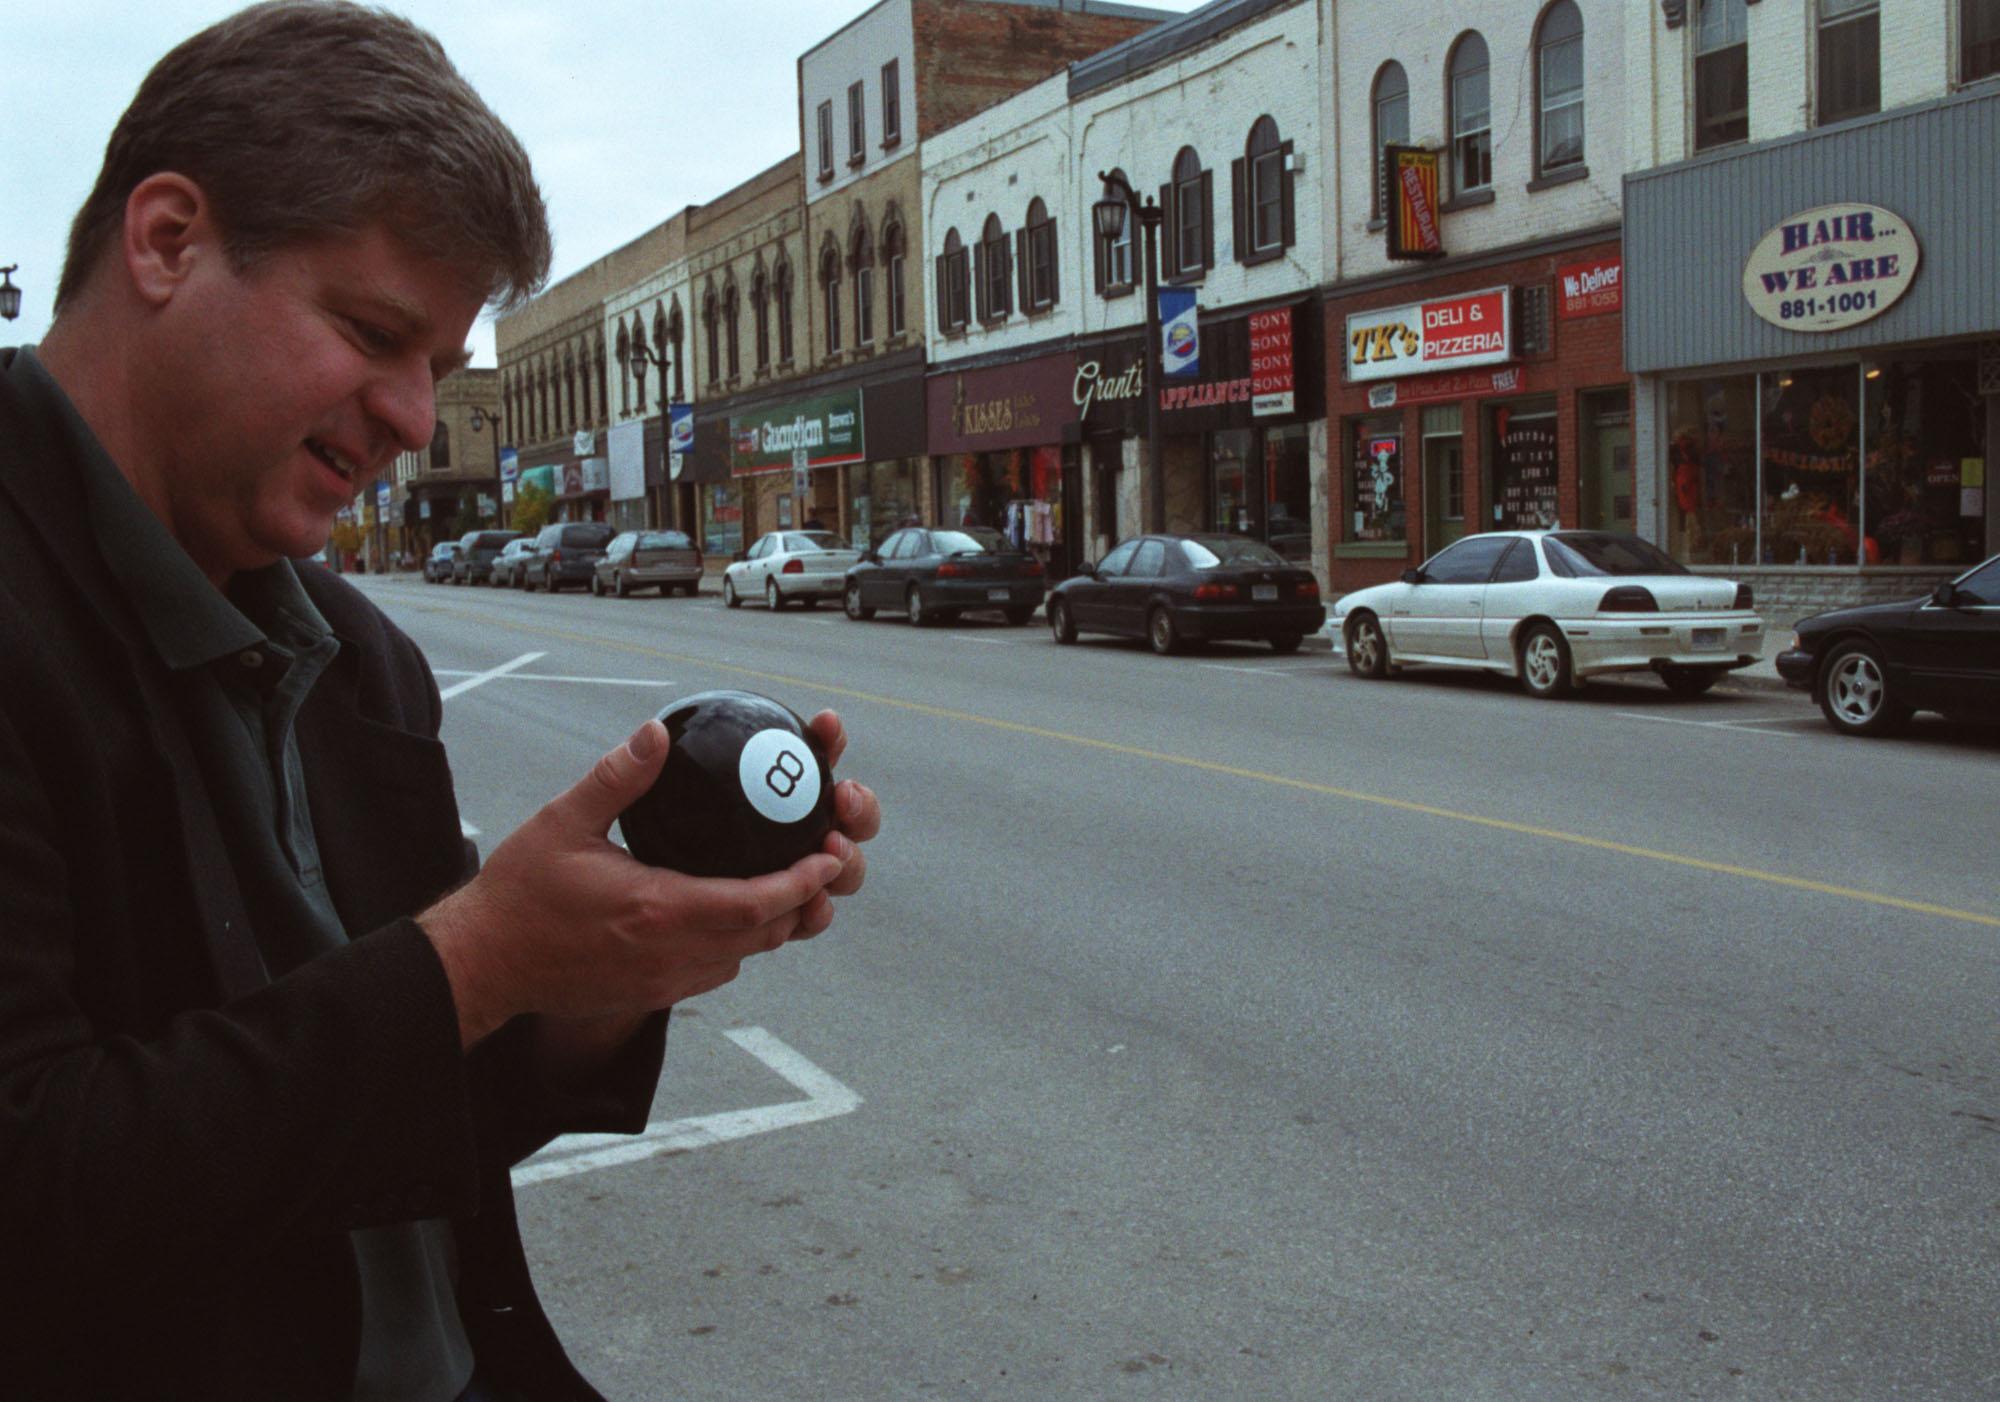 Man holding Magic 8 Ball toy